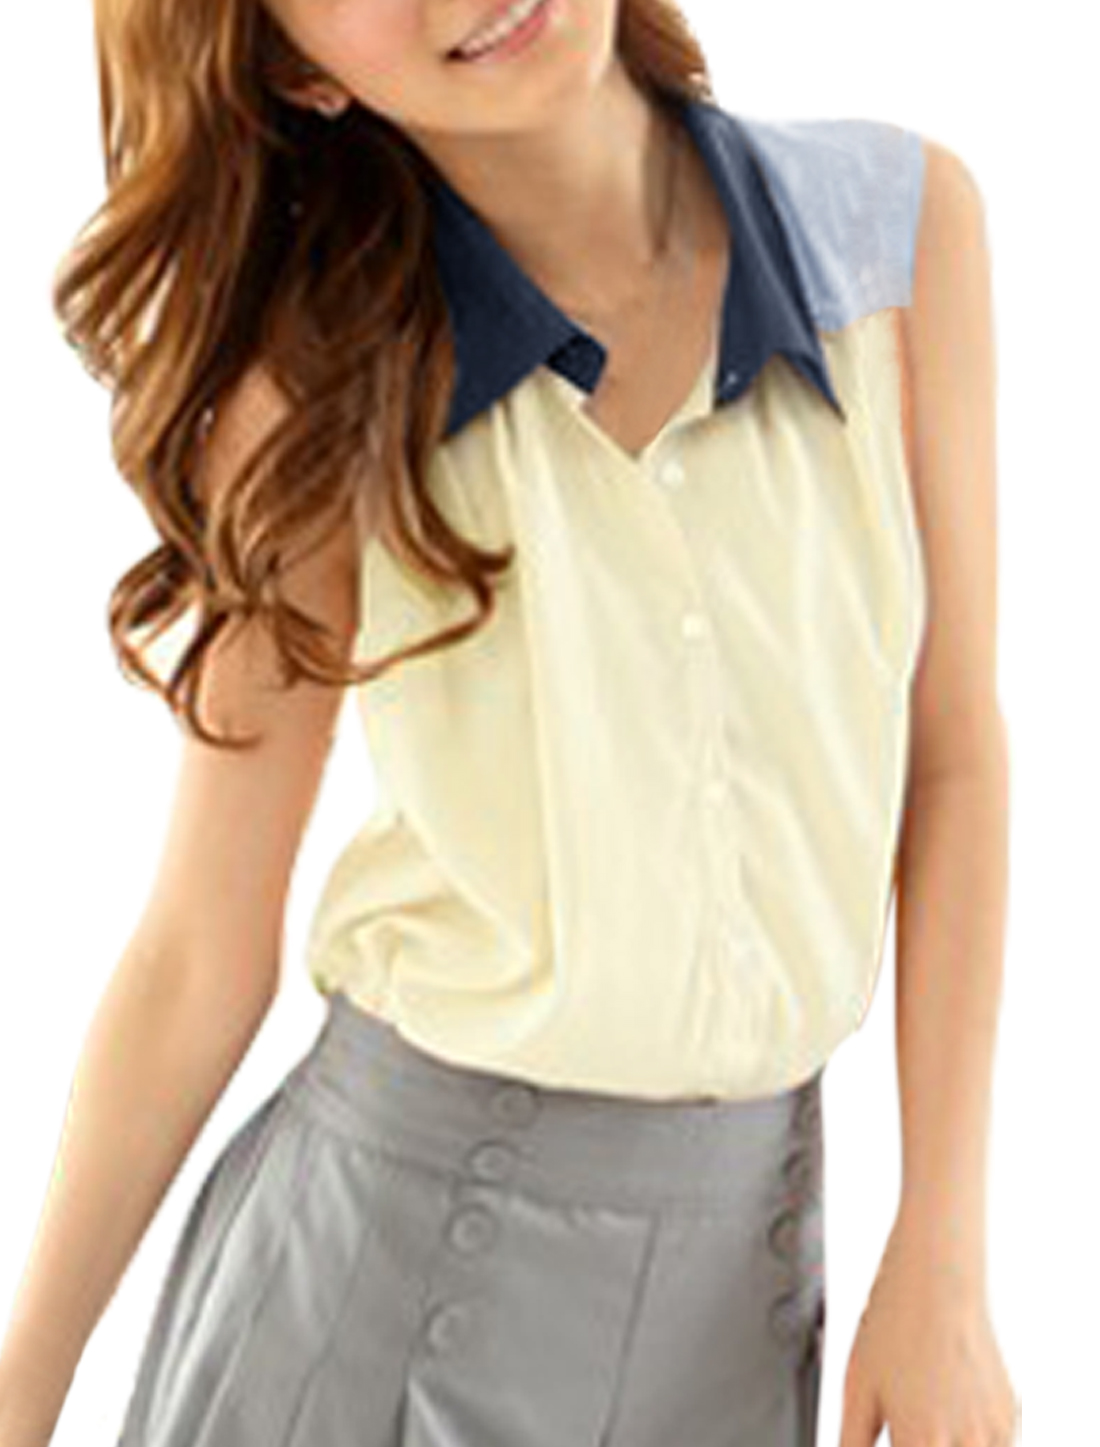 Women Stylish Single-Breasted Front Splice Design Beige Summer Blouse XL